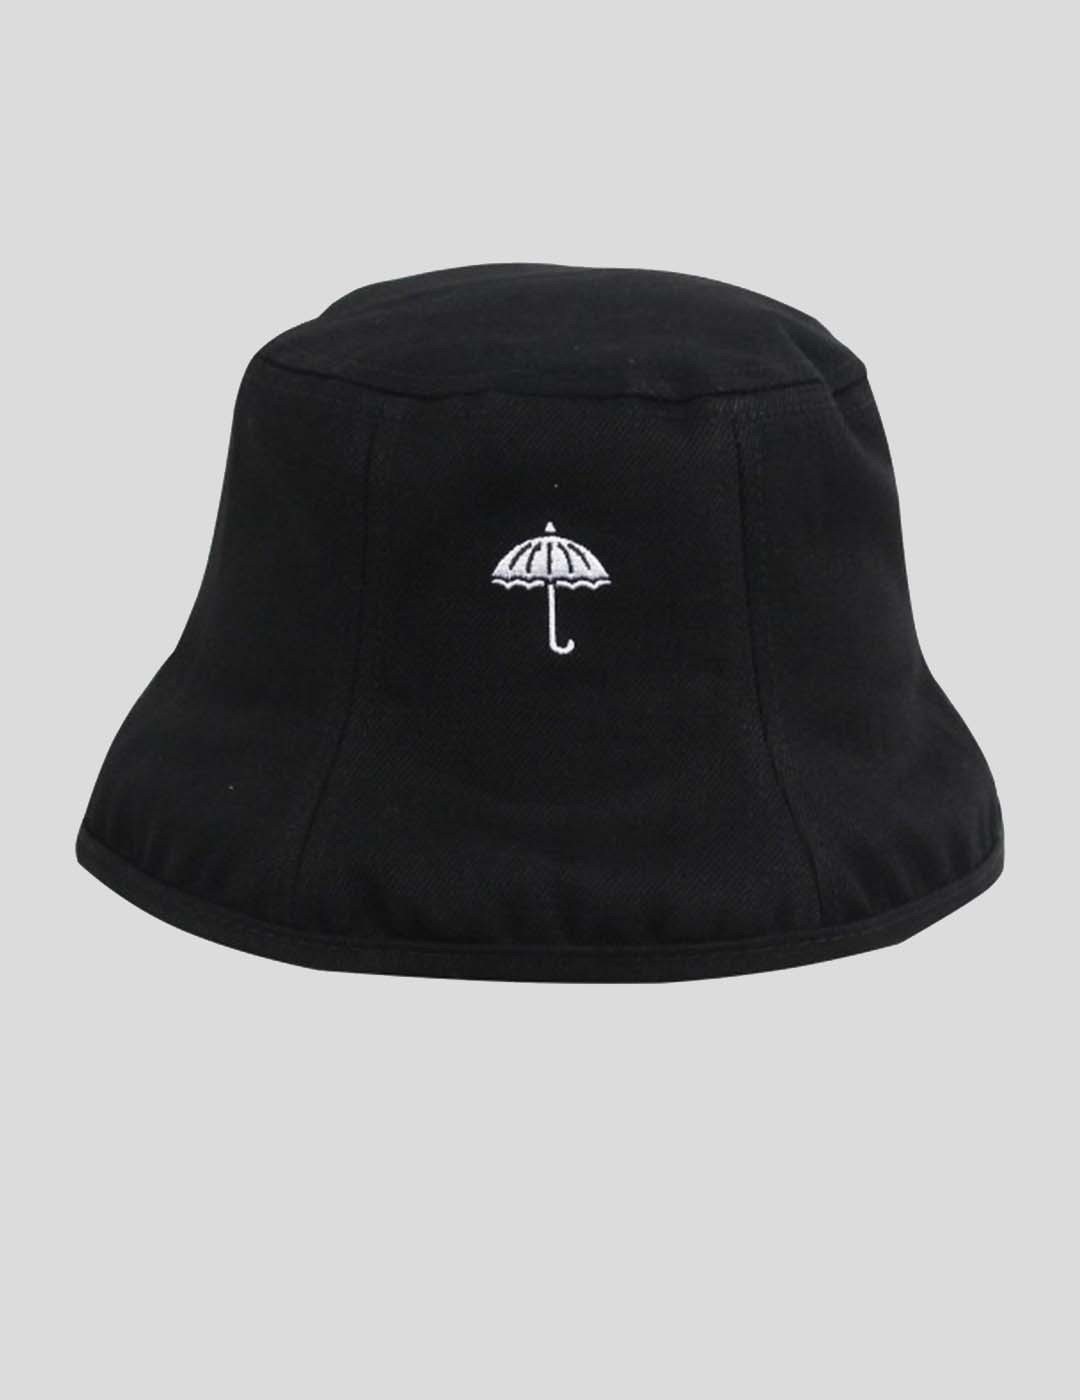 GORRO HÉLAS POPPINS BUCKET HAT BLACK